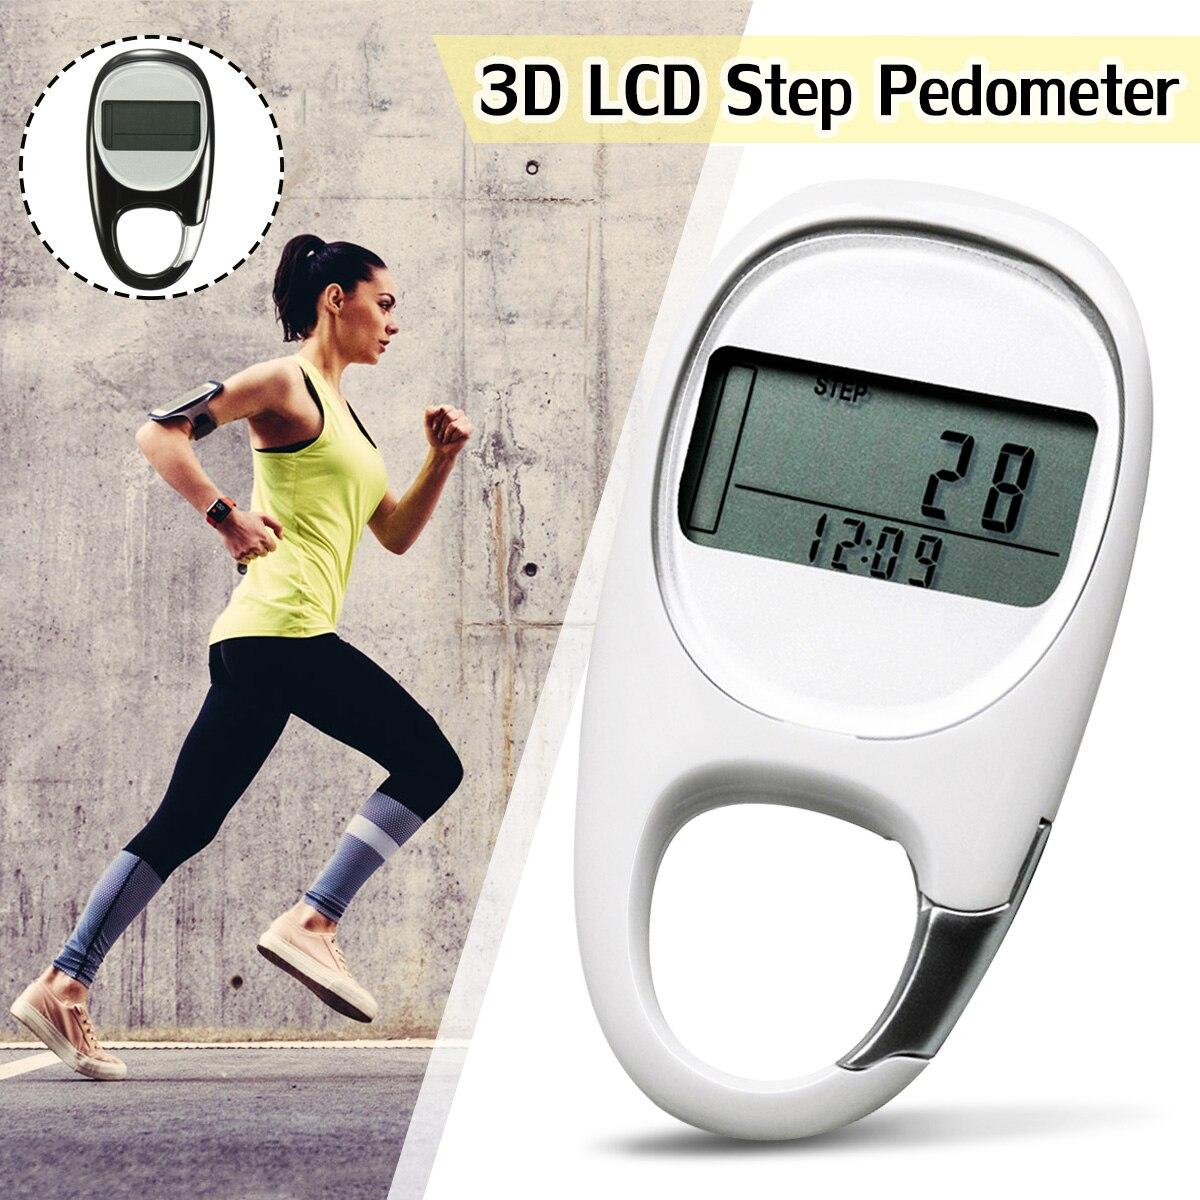 KeyChain 3D Smart Sensor Run Schritt Schrittzähler Karabiner Motion Kalorien LCD Display Zähler Tracker + Taste Batterie + Manuelle